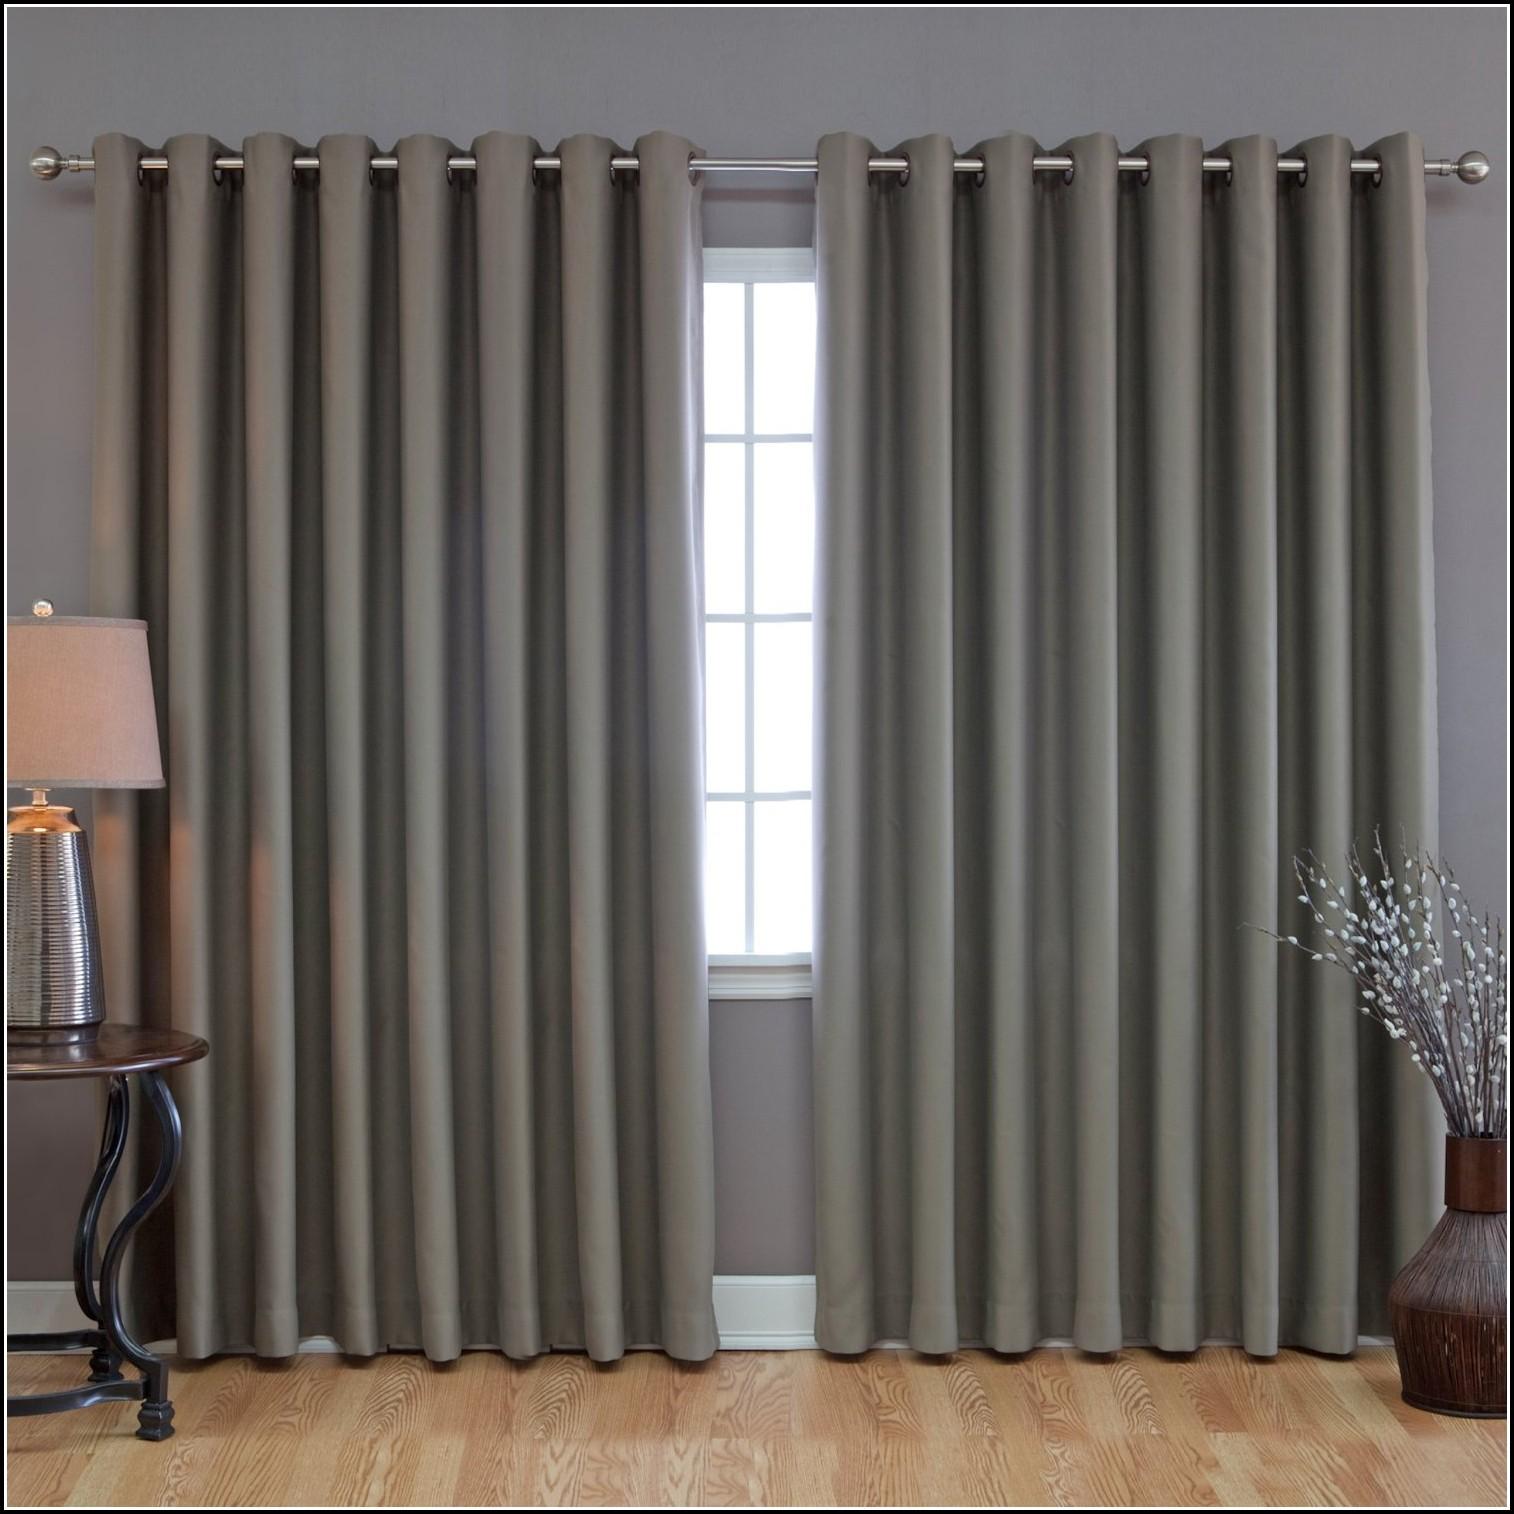 Sliding Door Double Curtain Rod